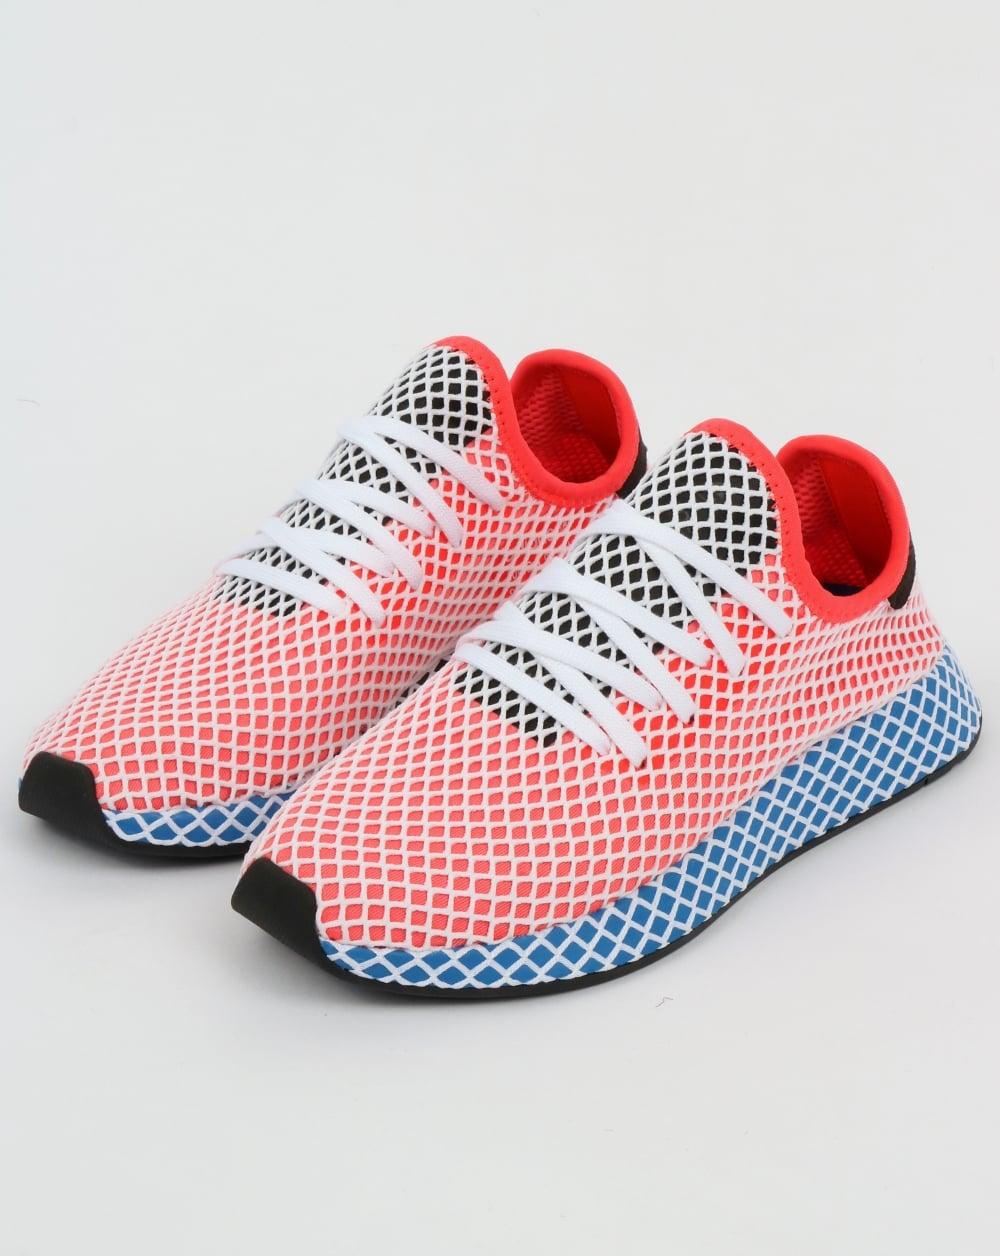 Adidas Deerupt Runner Trainers Solar